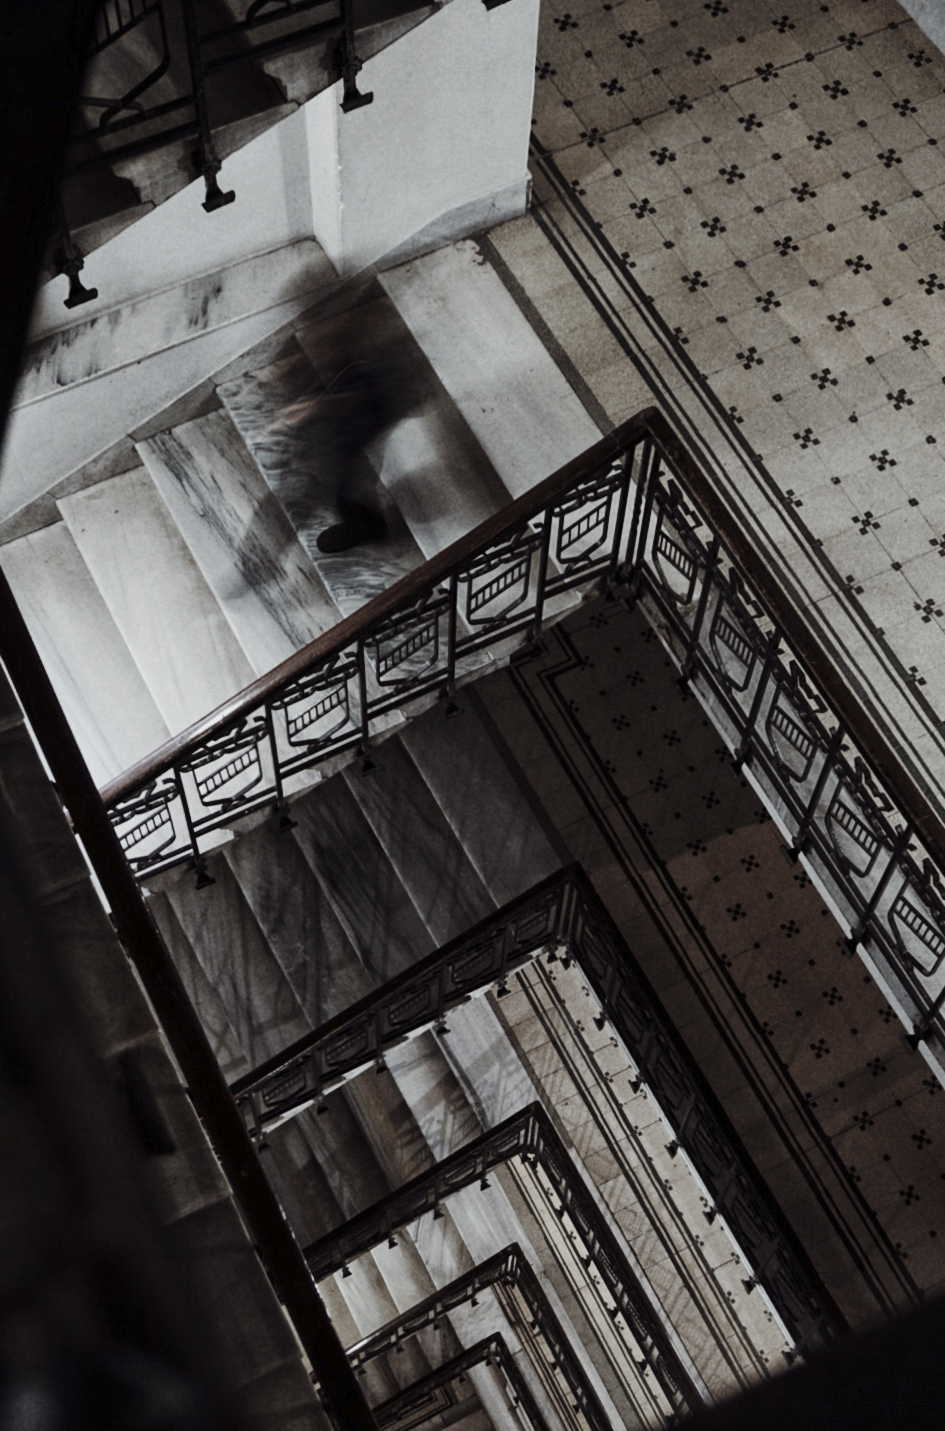 Misir Apartment in Taksim-9197.jpg